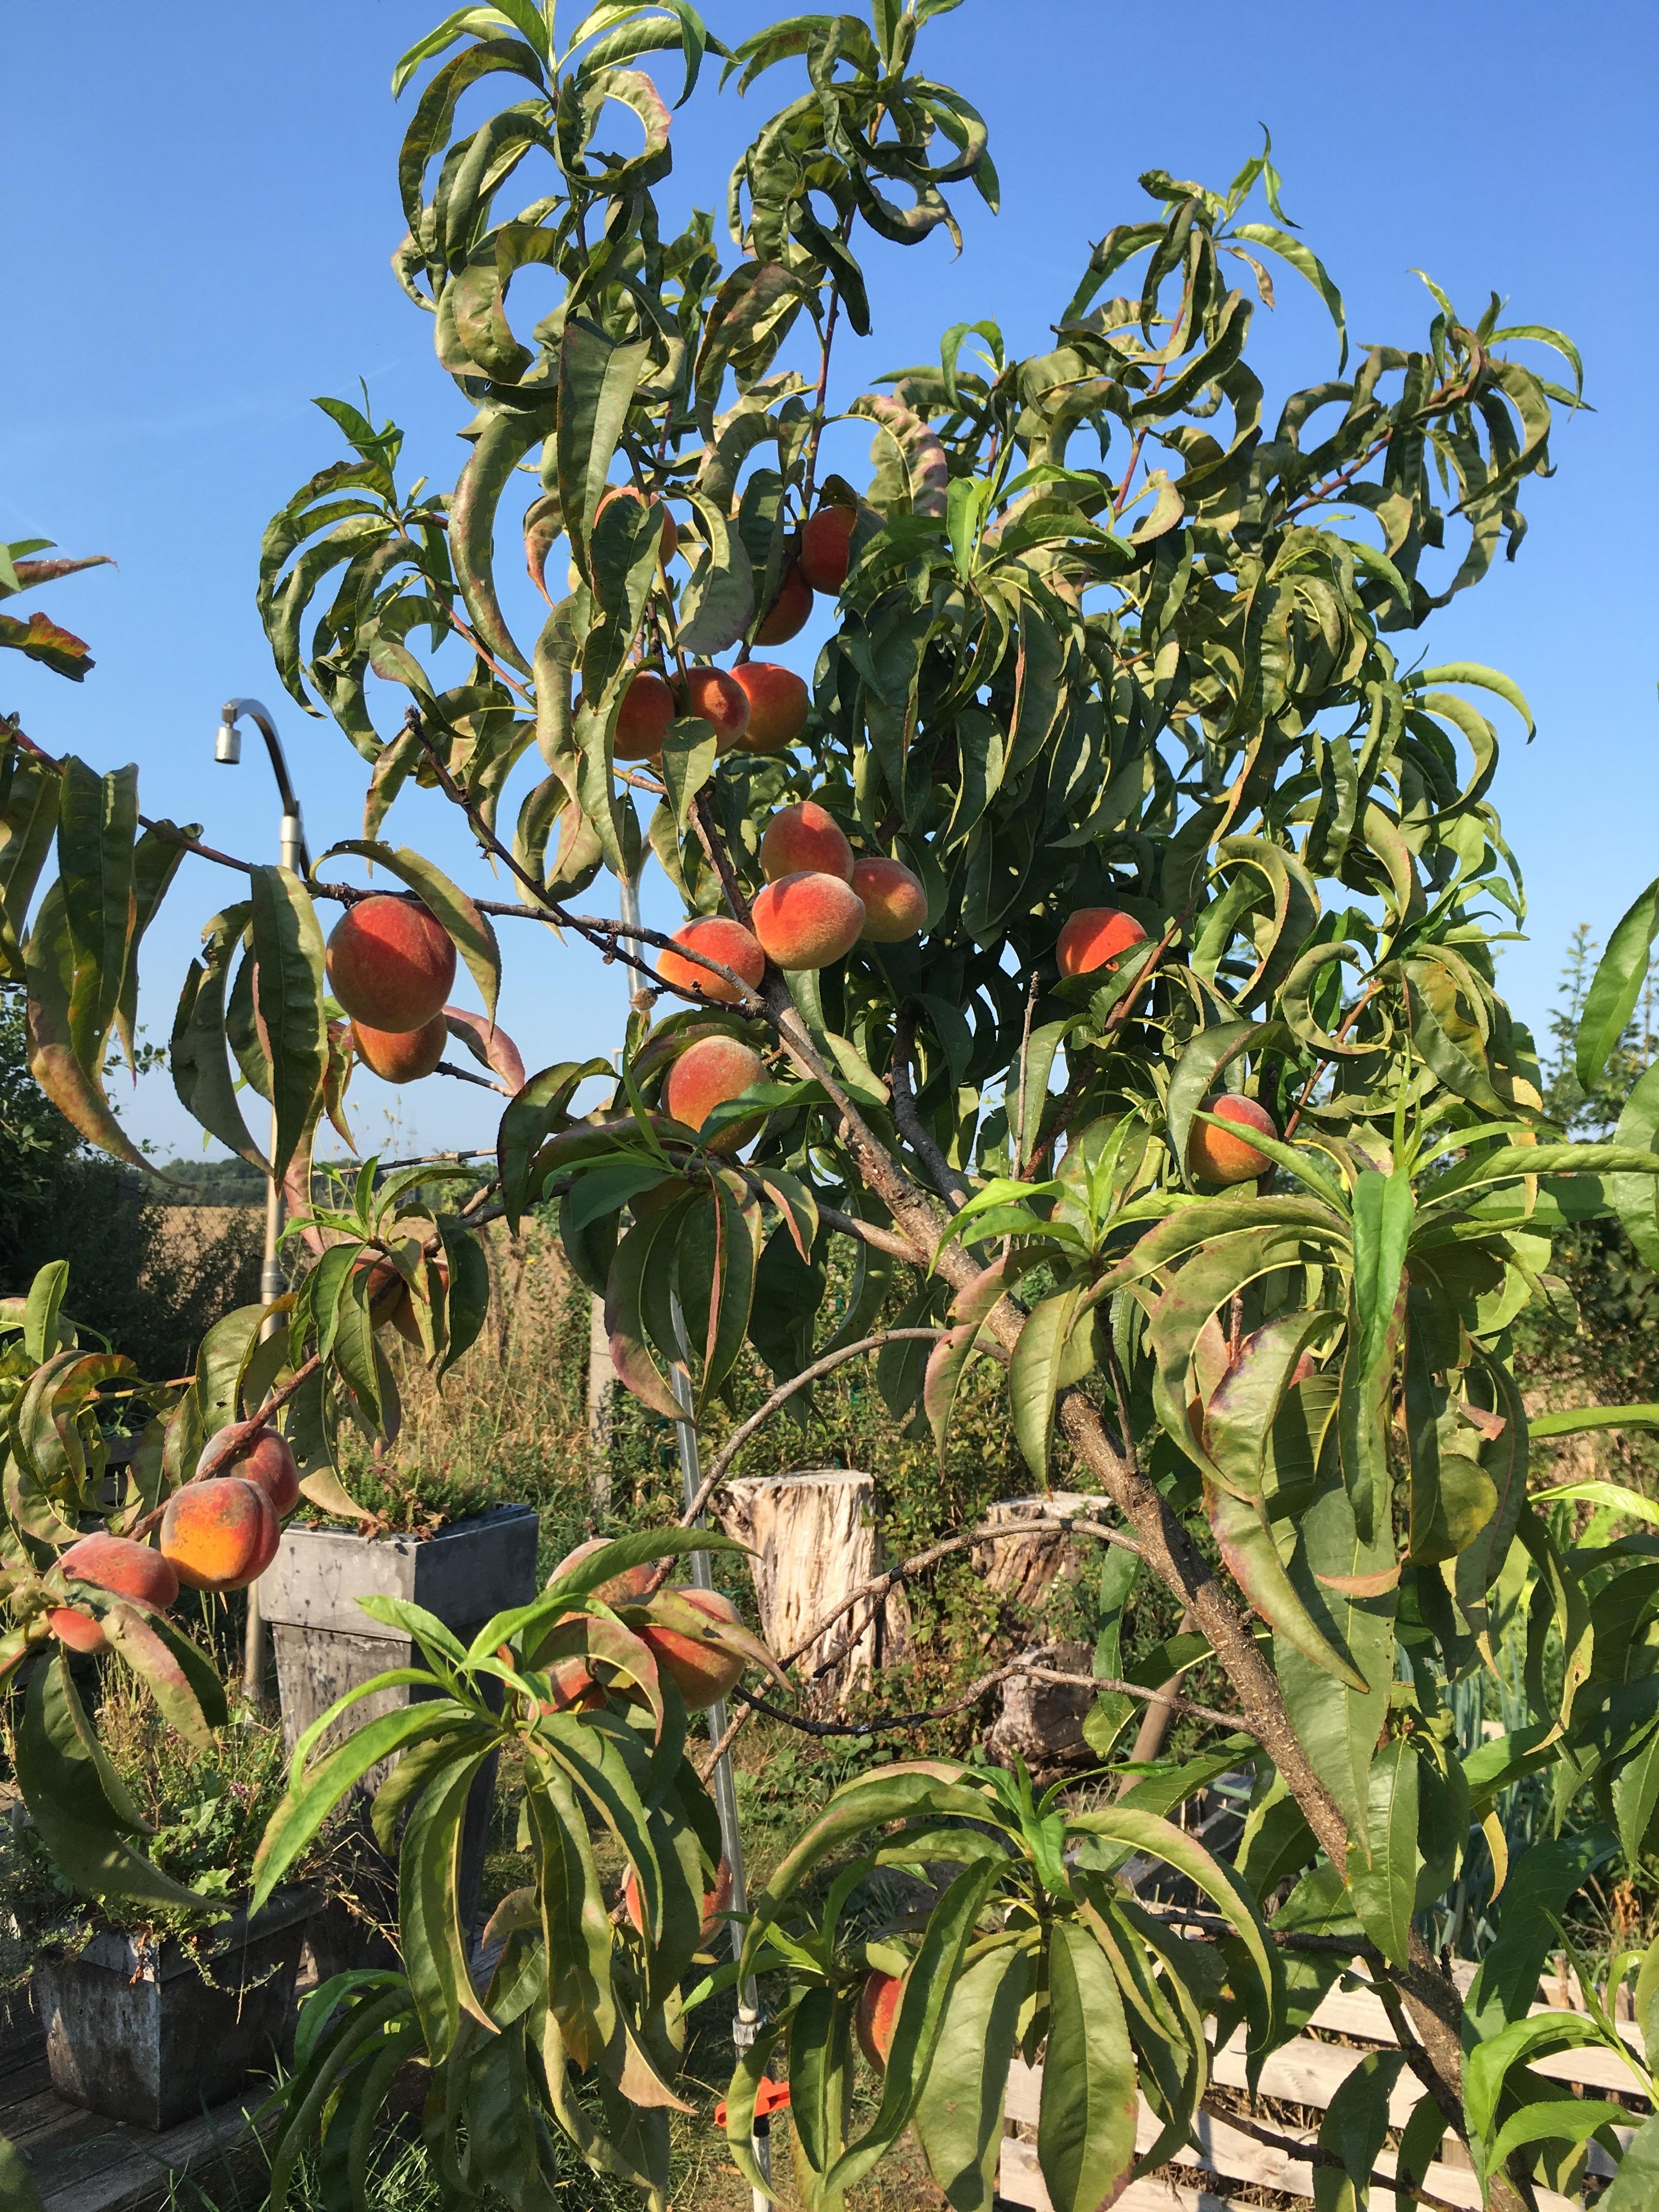 Pfirsichbaum at Dakota Home